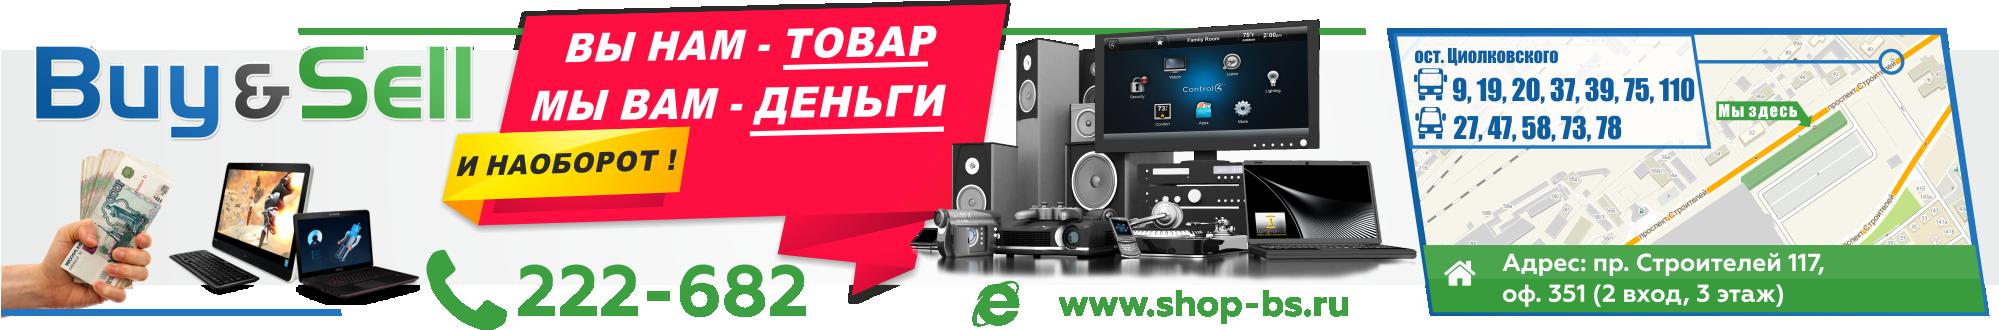 https://price-altai.ru/uploads/2017/04/281108044b3c45.png